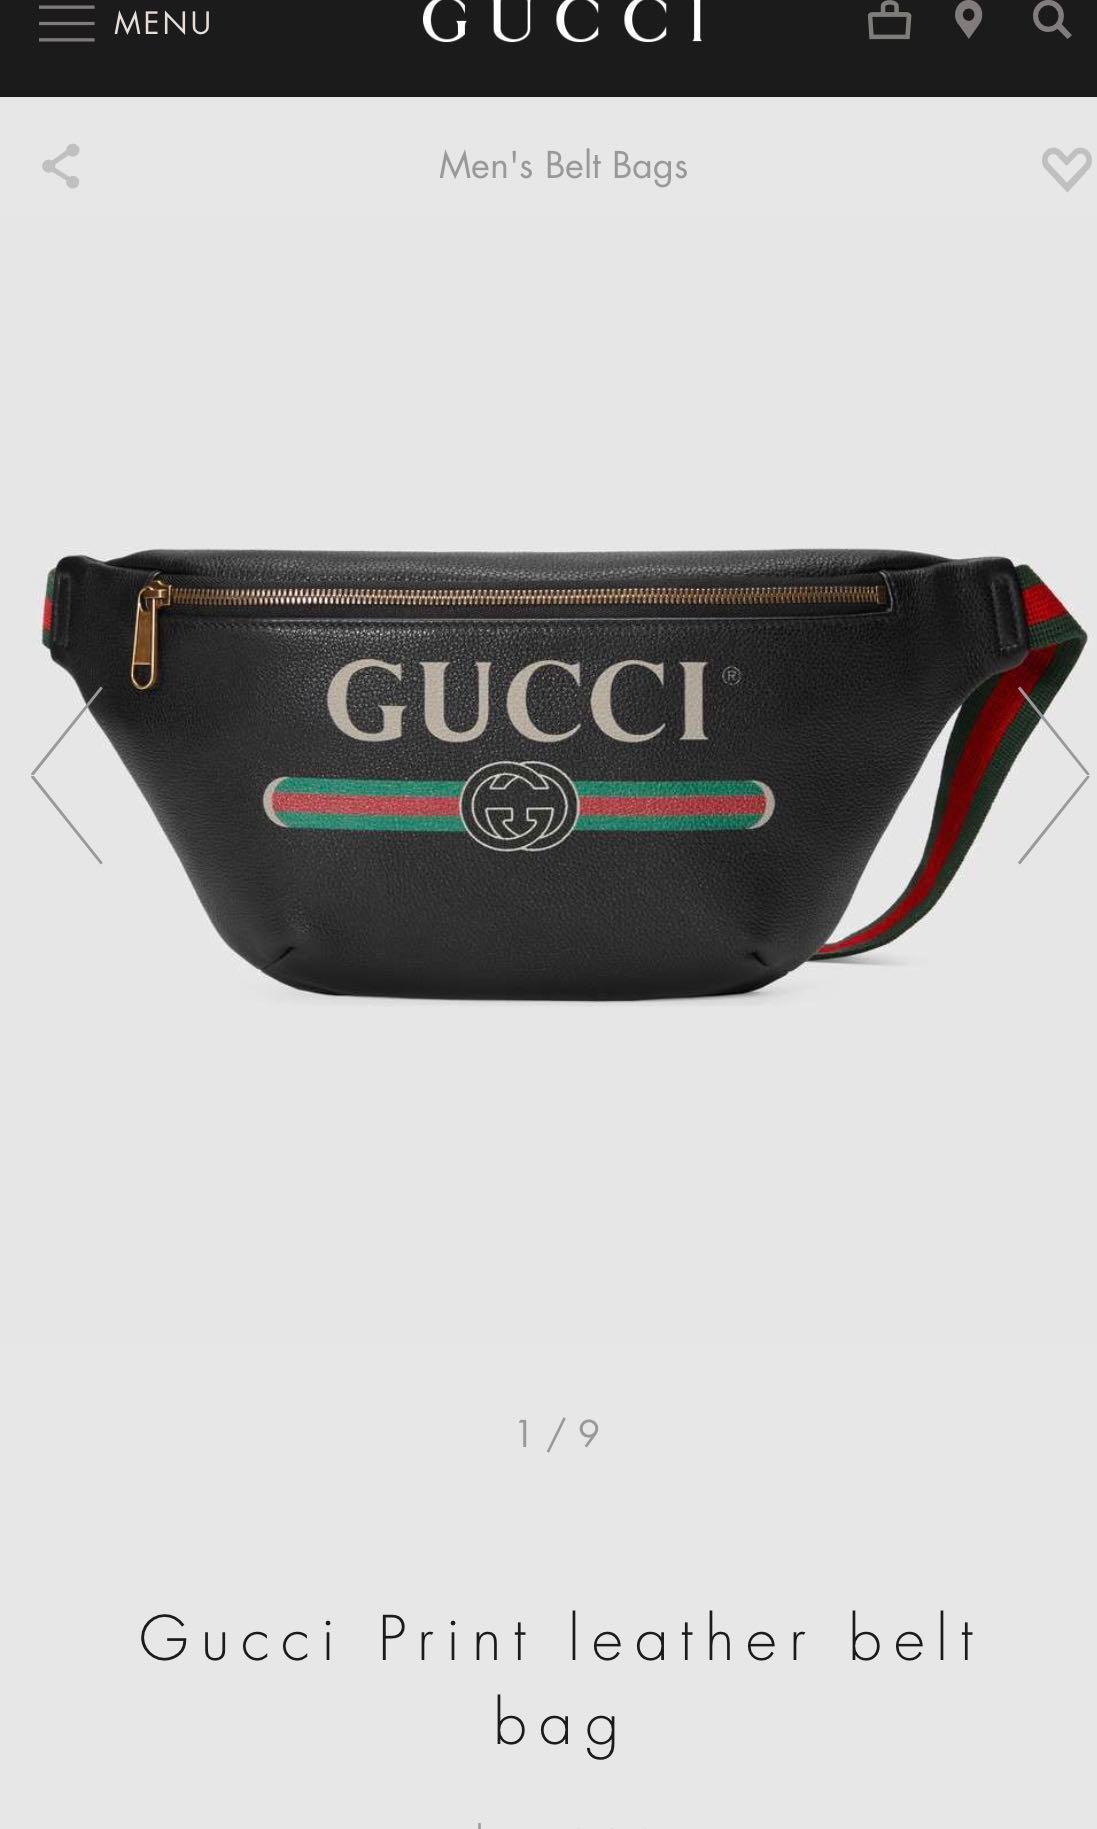 900c463599f8 Gucci Print Leather Belt Bag, Luxury, Bags & Wallets, Handbags on ...